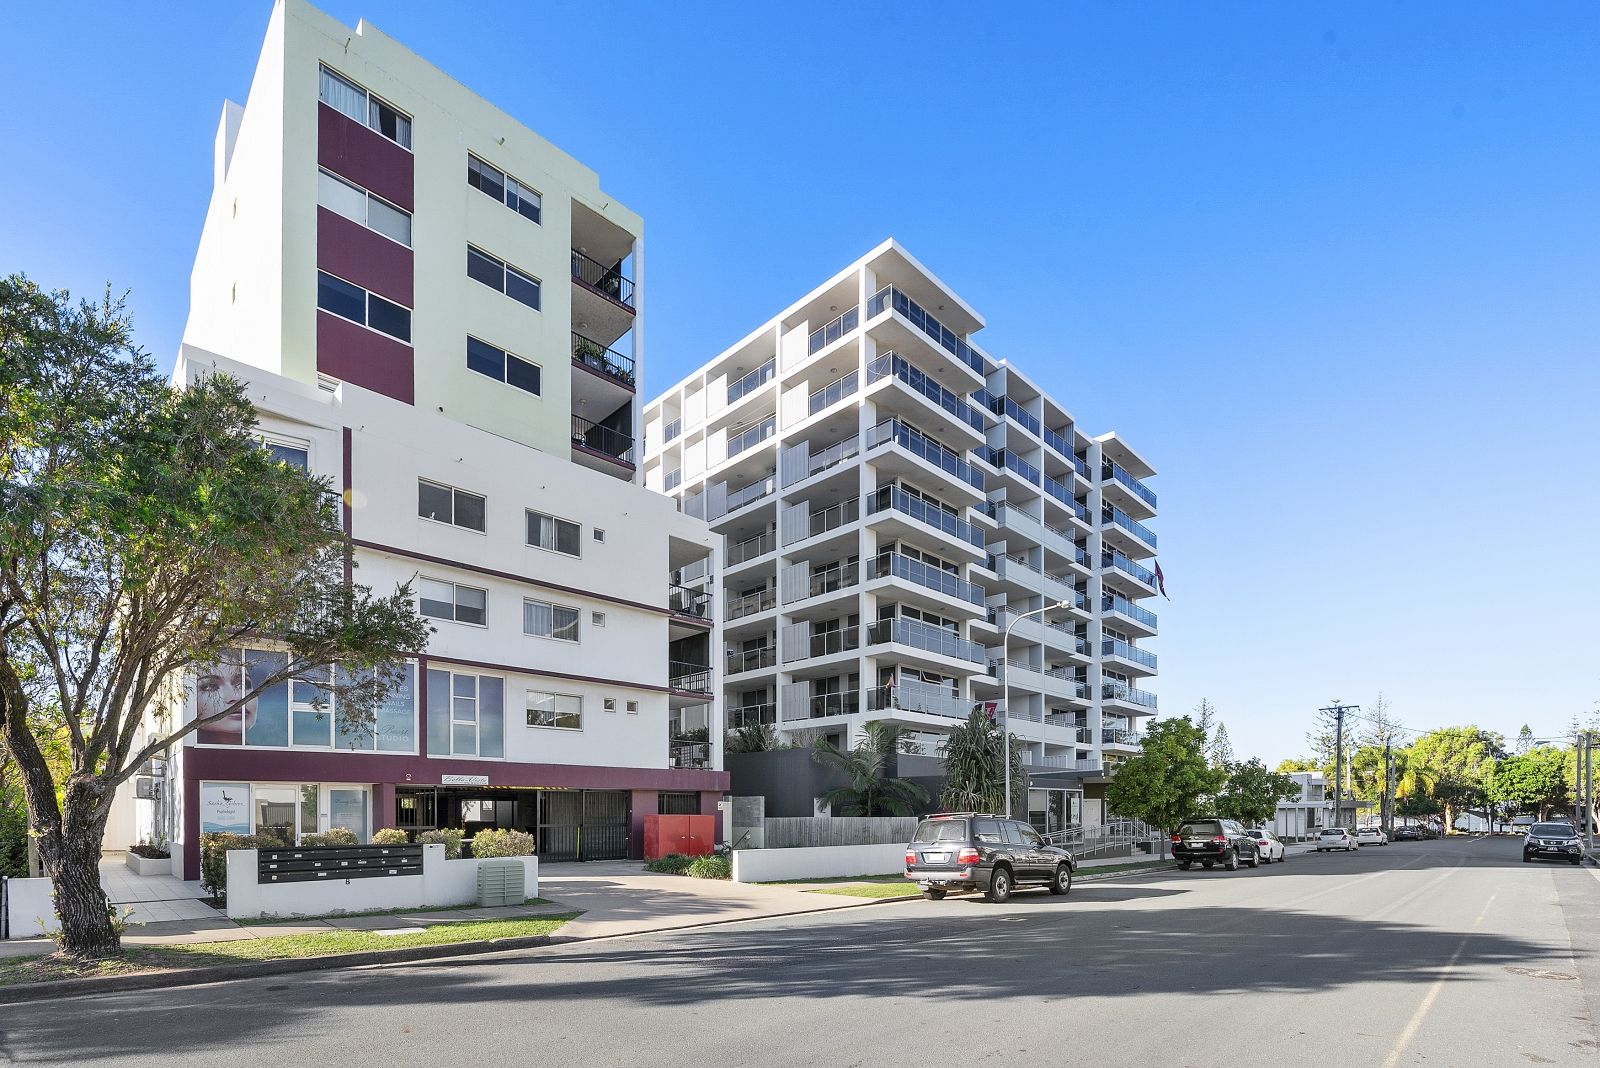 5/8 Bunton Street, Scarborough QLD 4020, Image 0